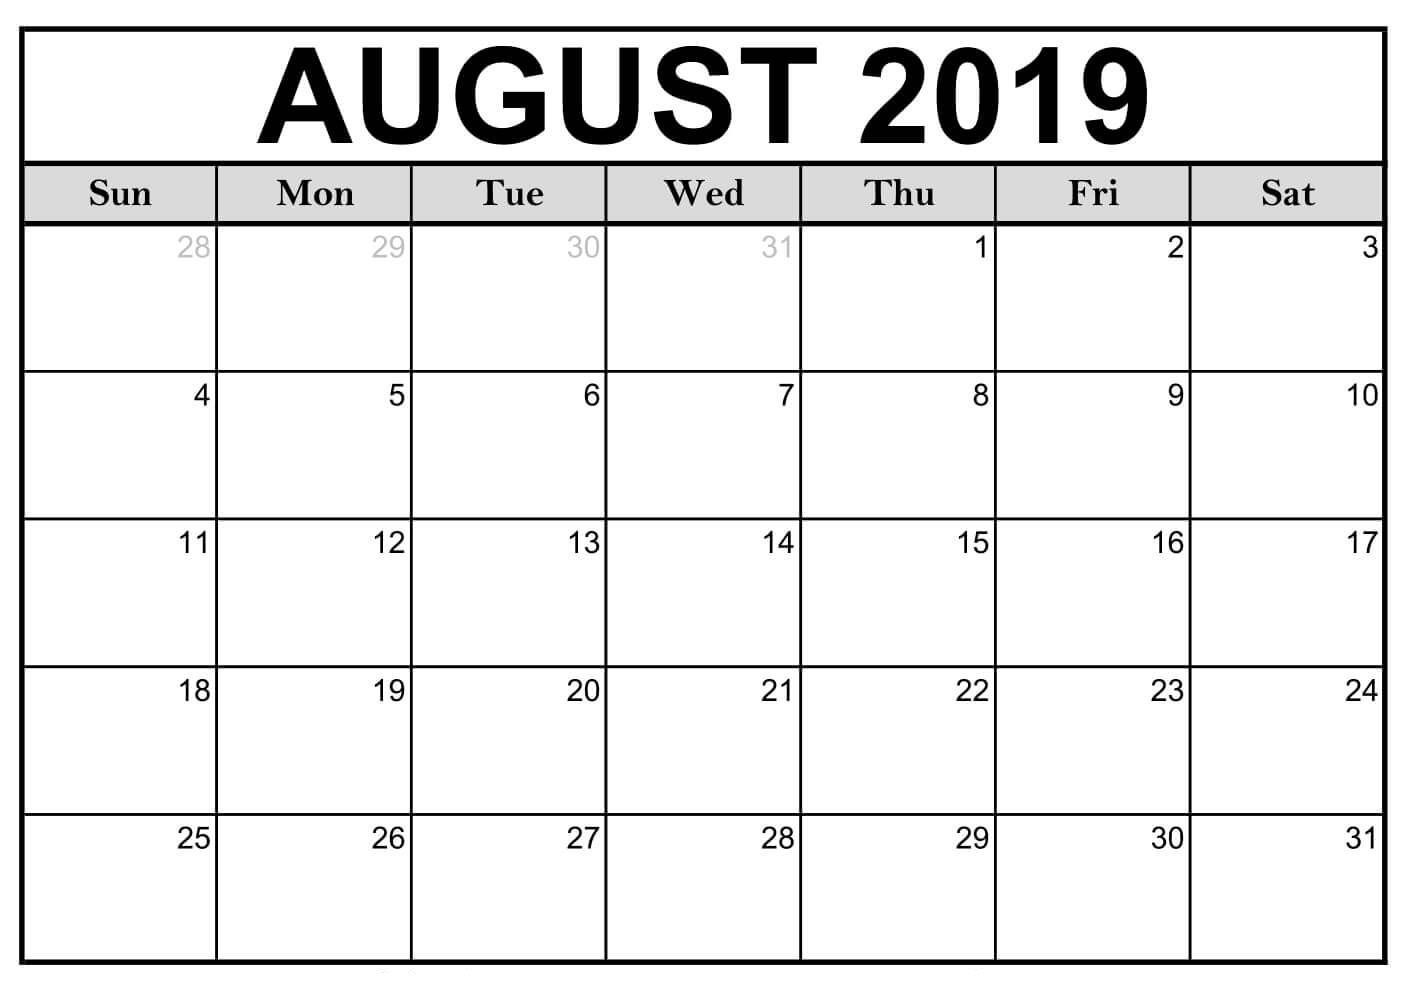 Collect 2019 Calendar Printable Word August Monthly Calendar